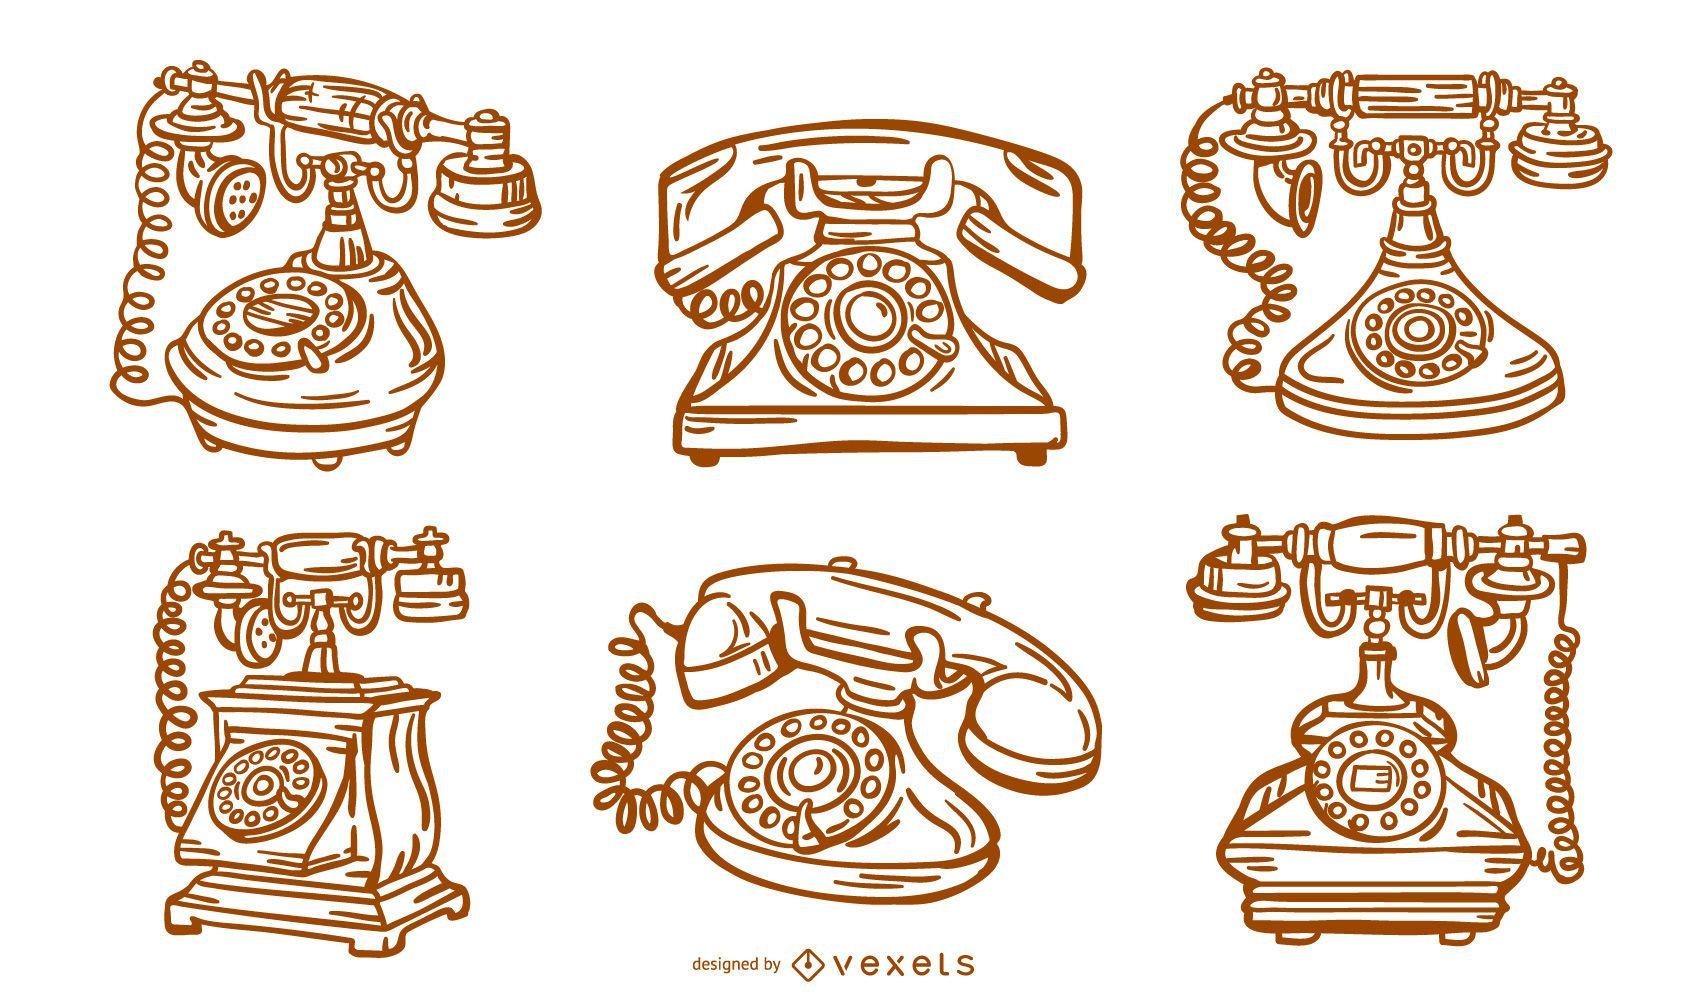 Antique Phone Stroke Design Pack